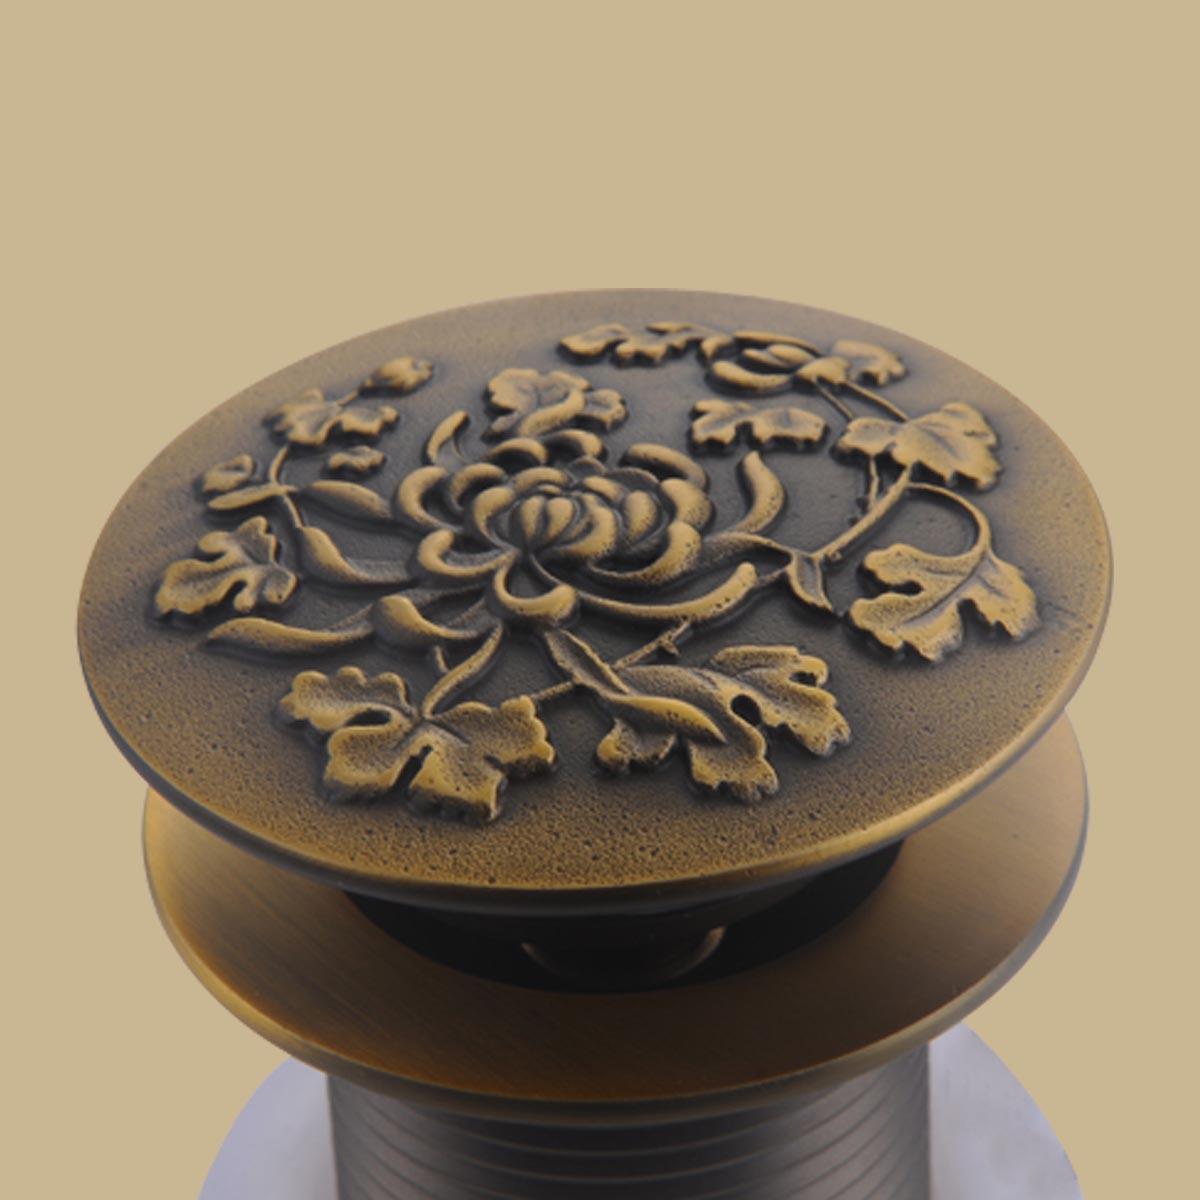 Antique Brass PopUp Sink Drain Decorative Carving Pack of 2 Sink Drain Sink Drains Bathroom Sink Drain